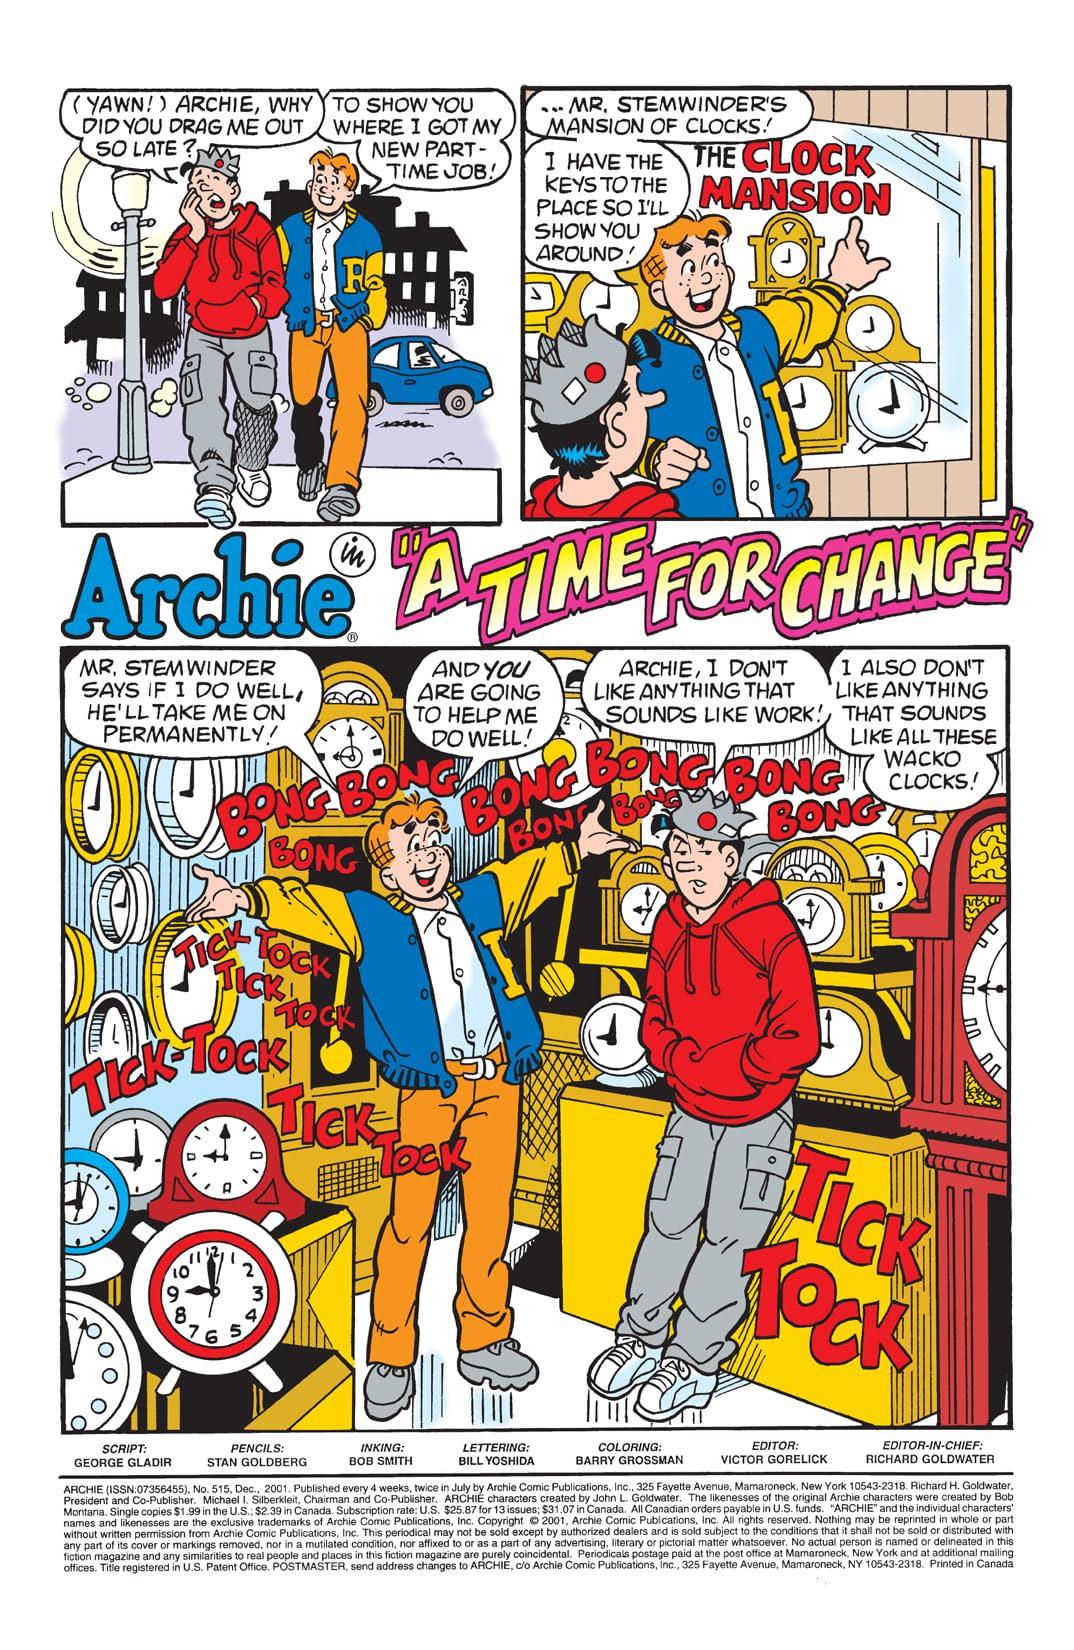 Archie #515